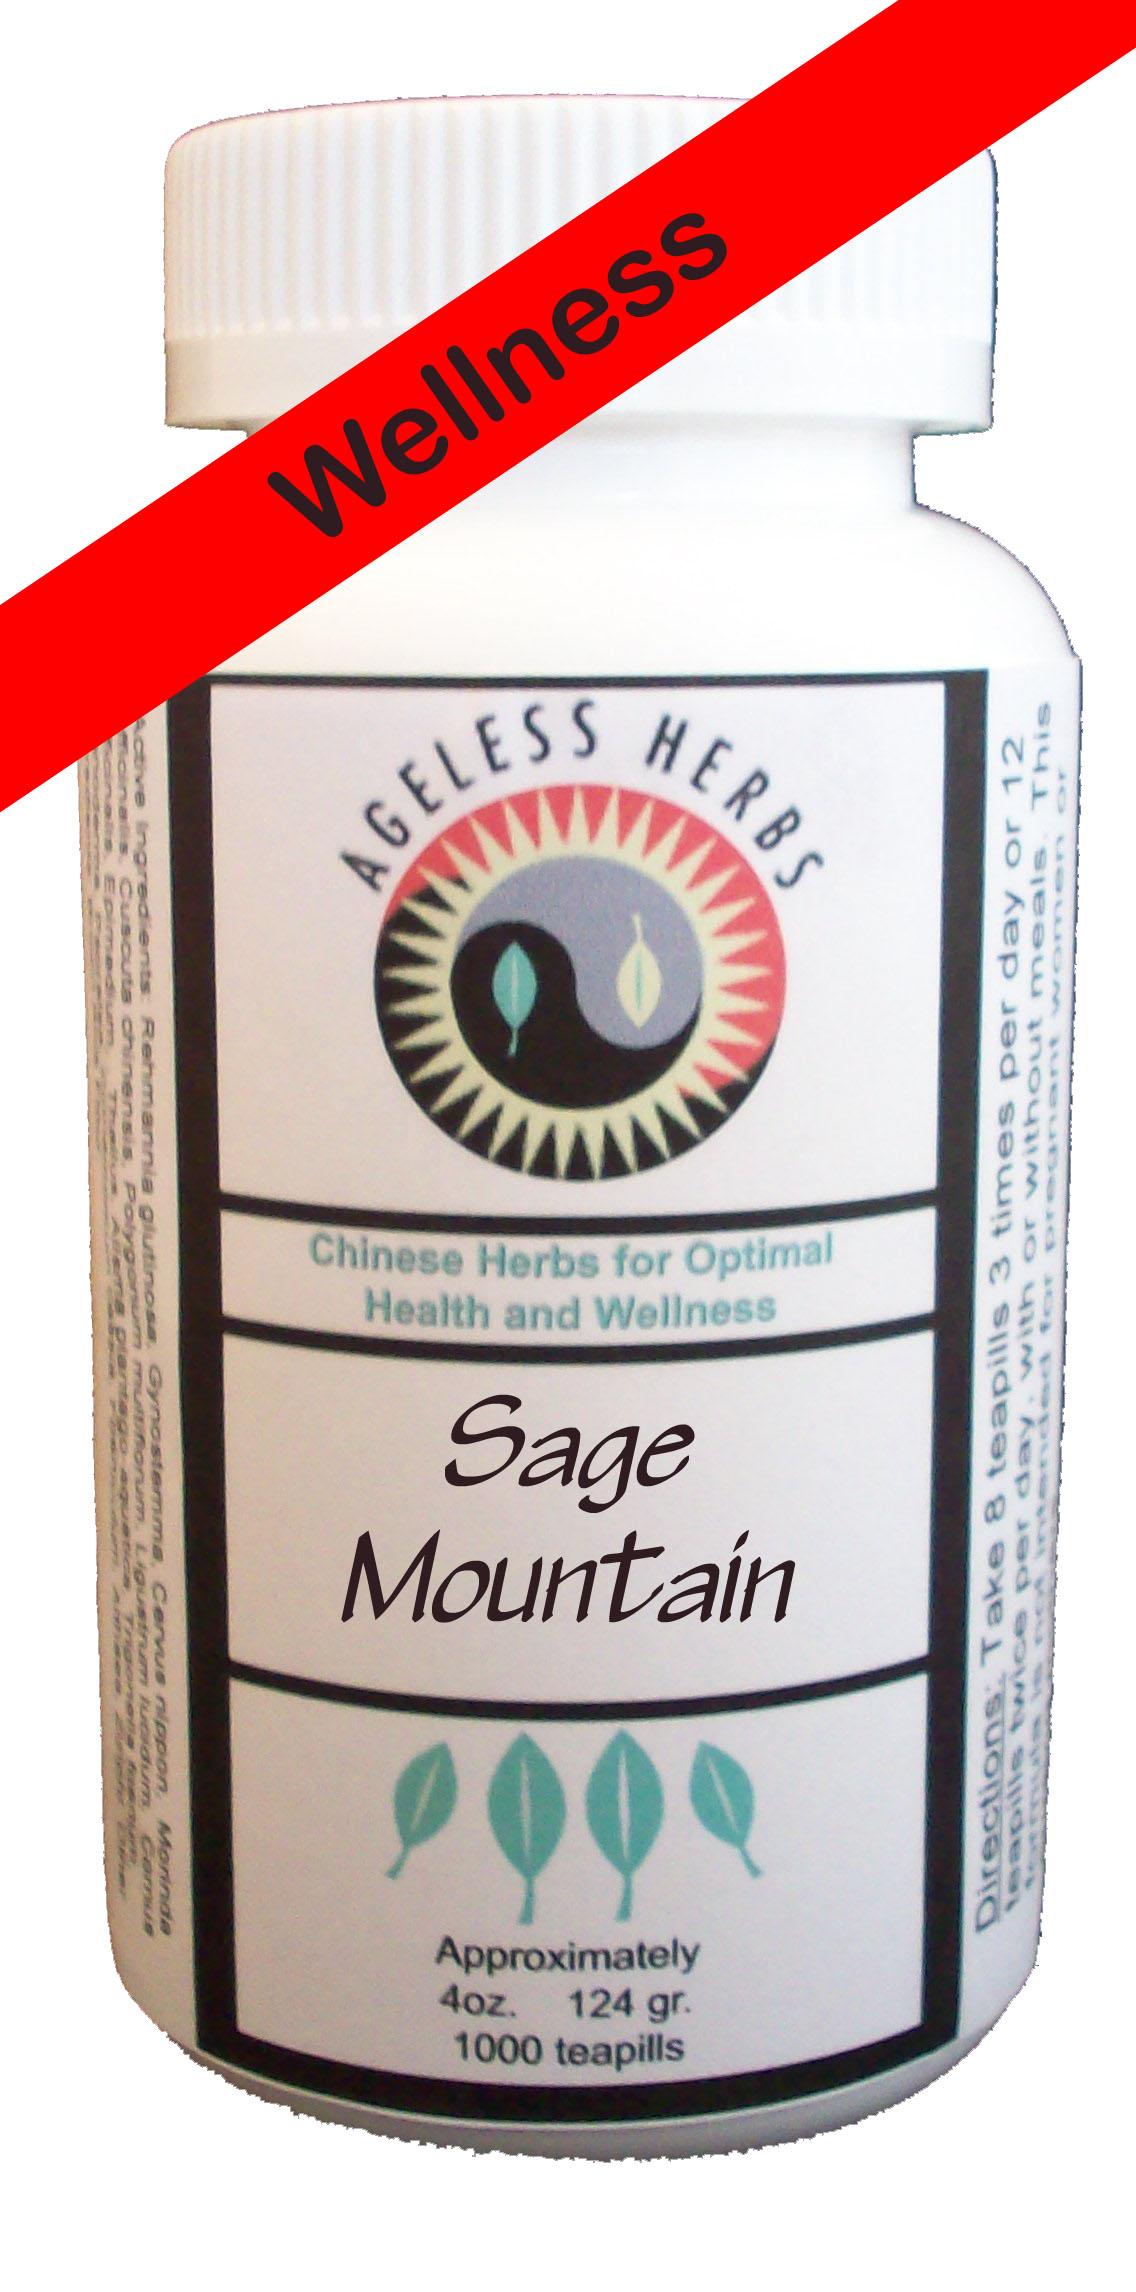 Longevity-Wellness organic herb formula